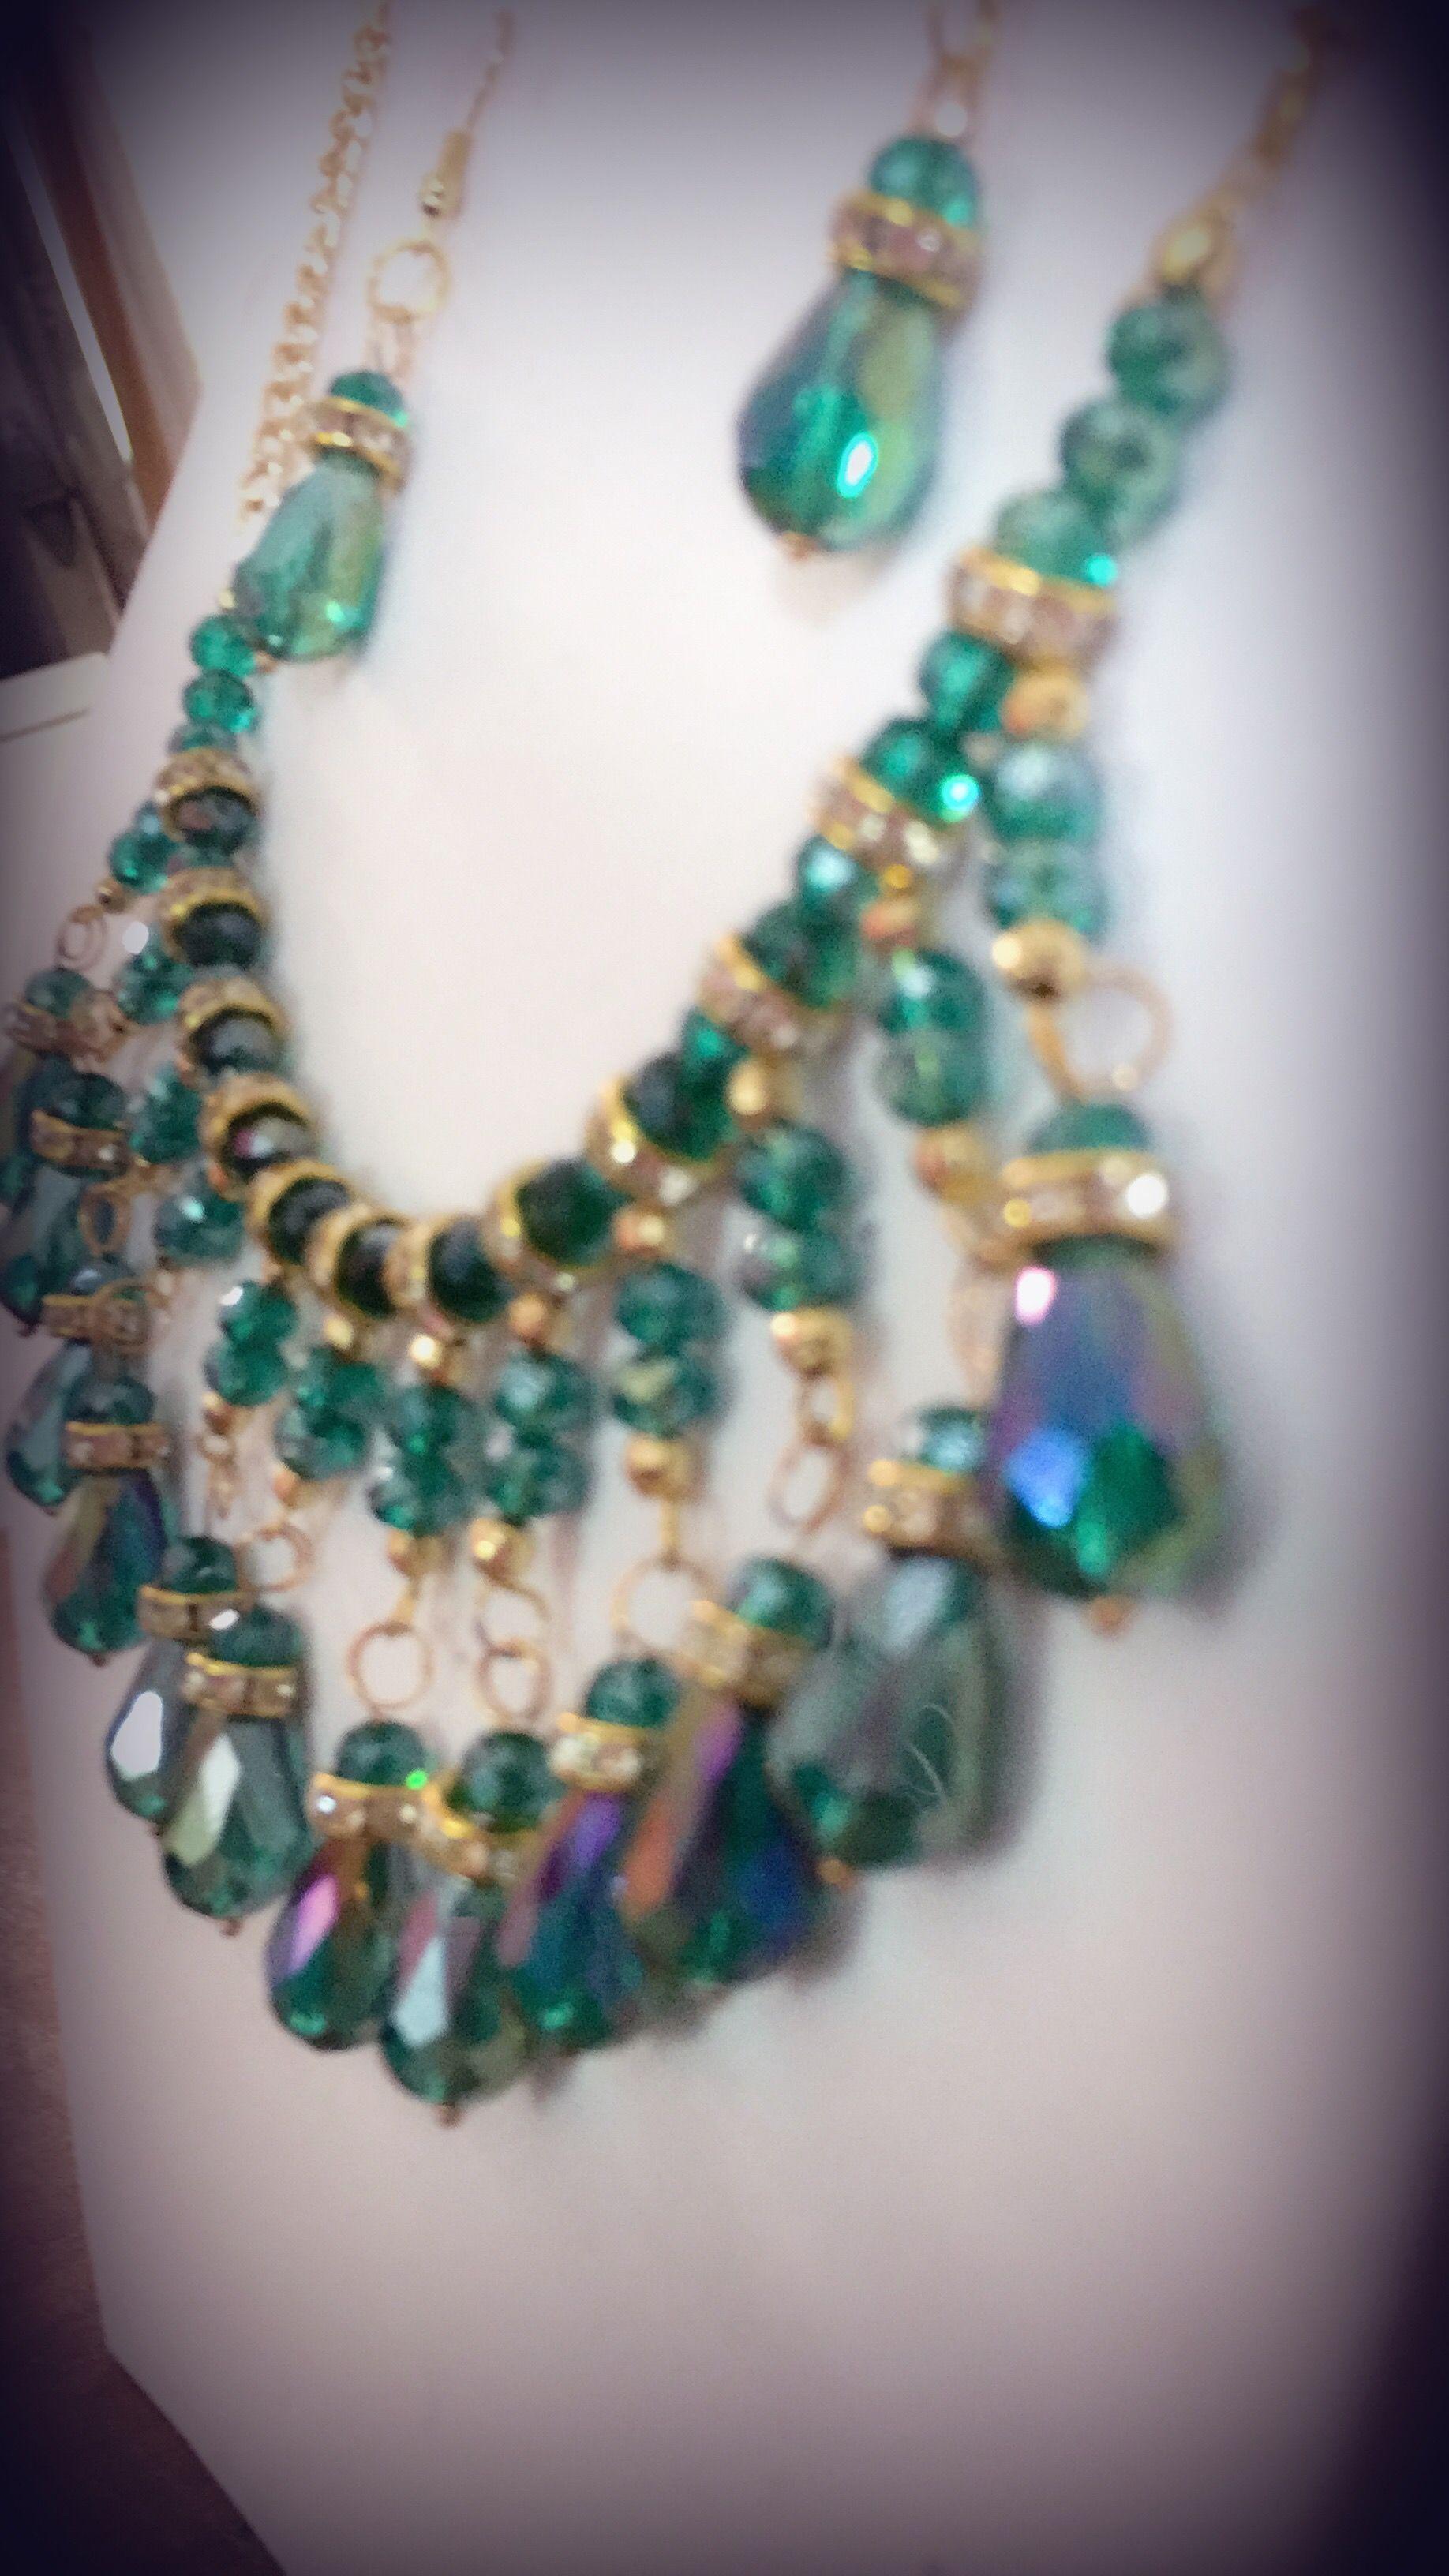 9b9729dd69d1 Collar bisutería en gota cristal verde